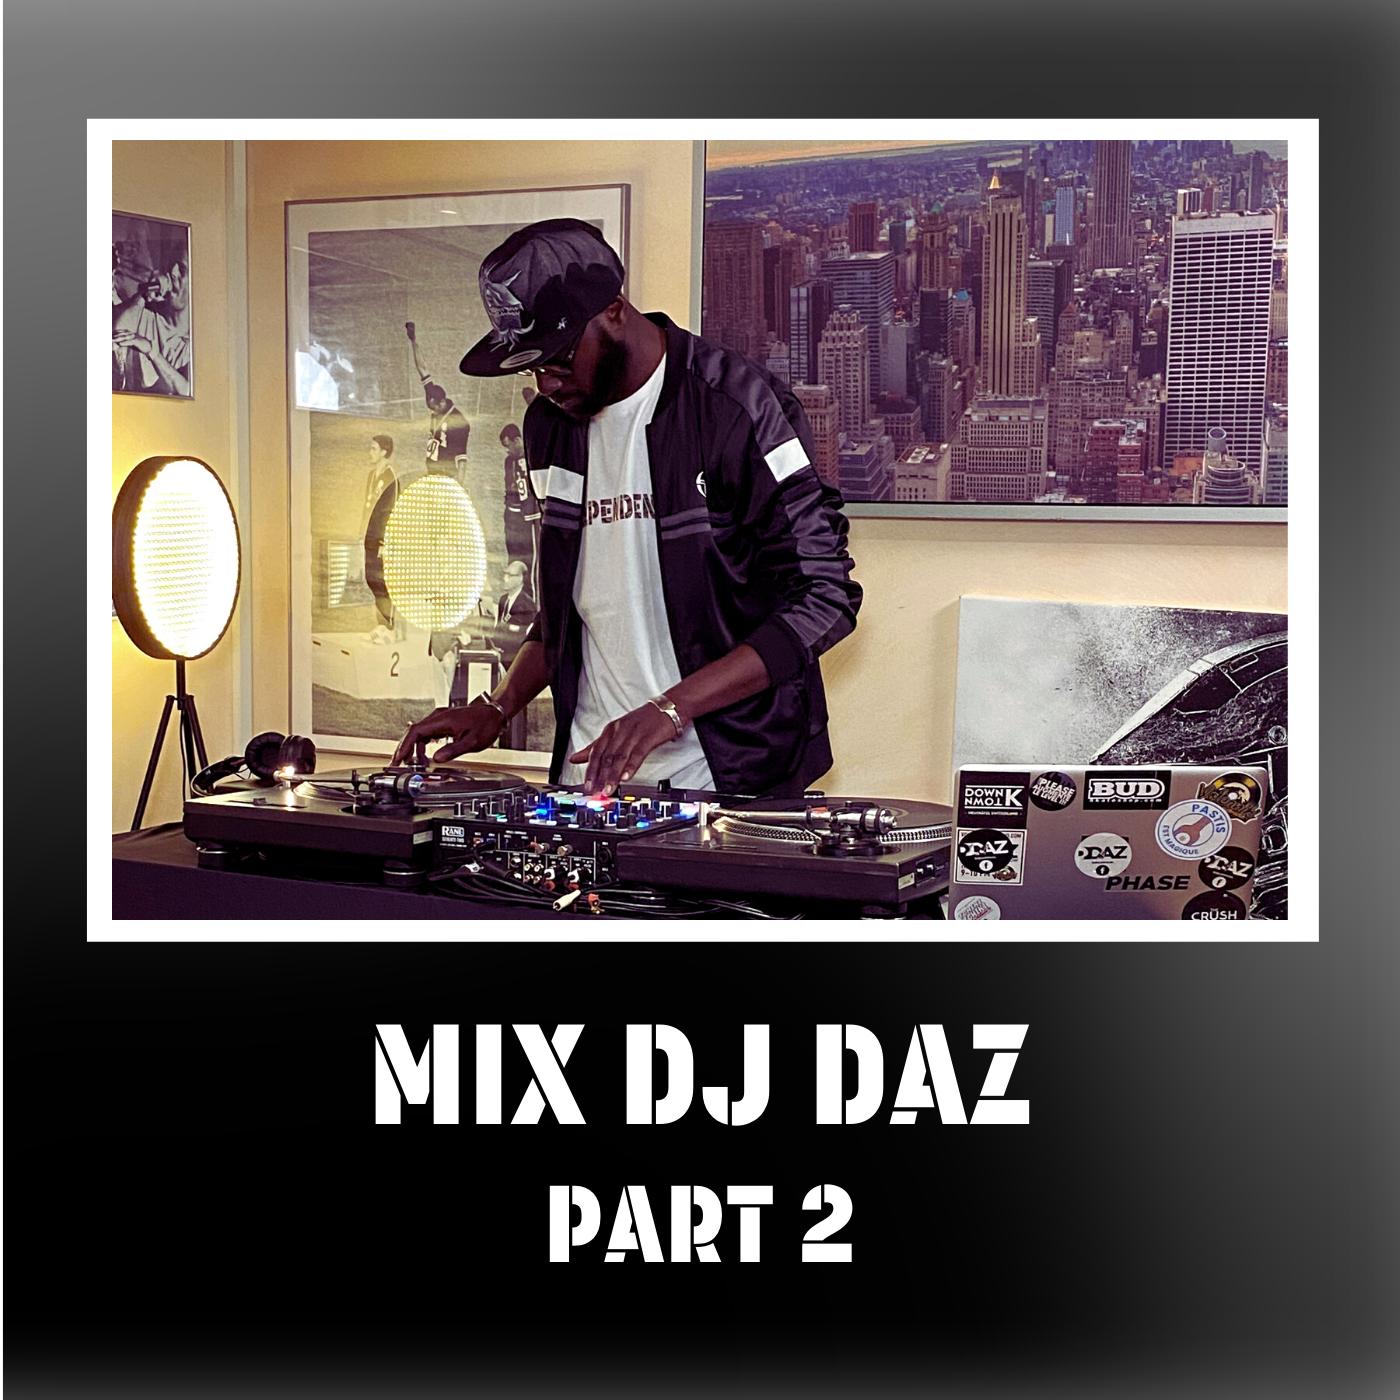 MIX DJ DAZ PART2